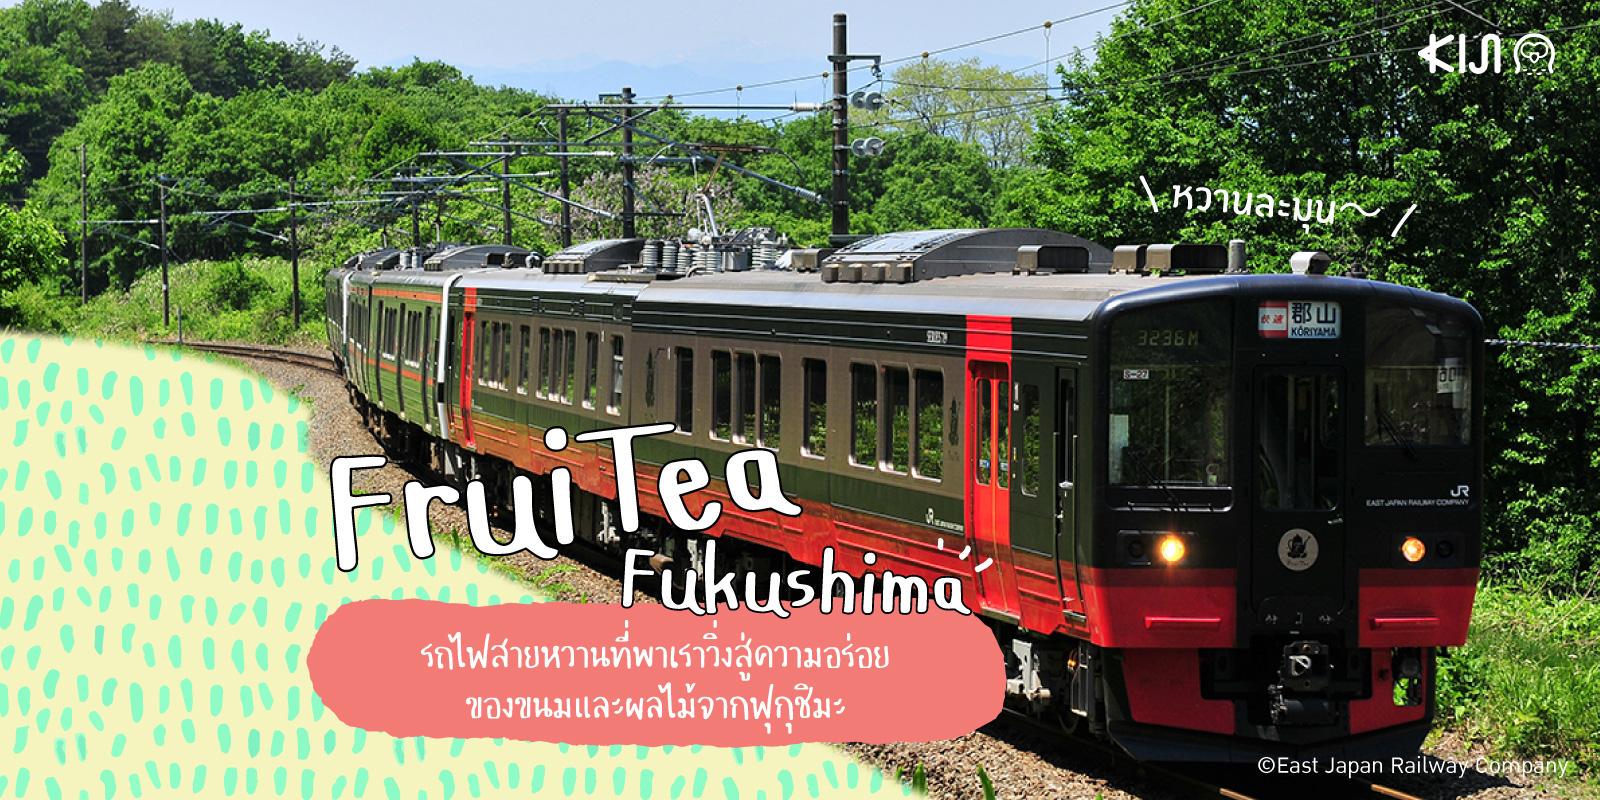 FruiTea Fukushima รถไฟสายหวานสู่ฟุกุชิมะ